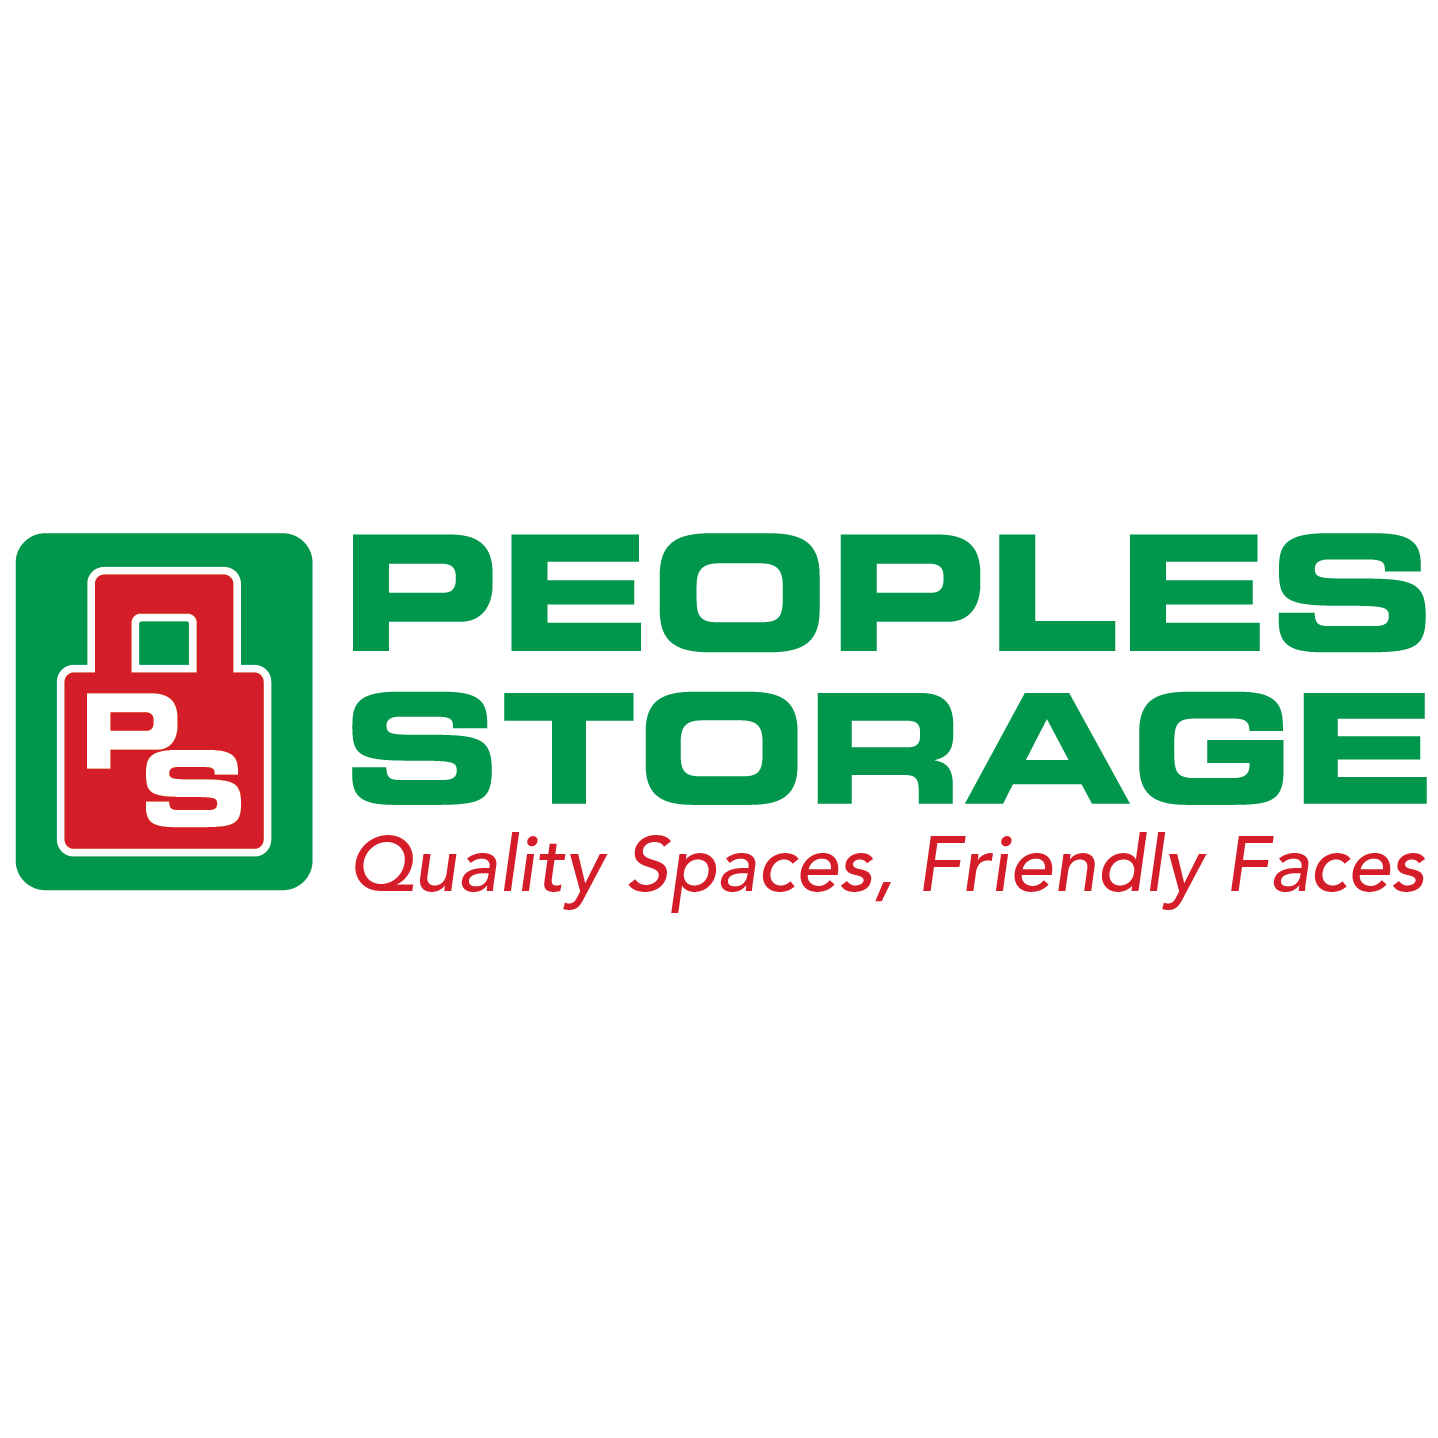 Peoples Storage Kenmore Logo